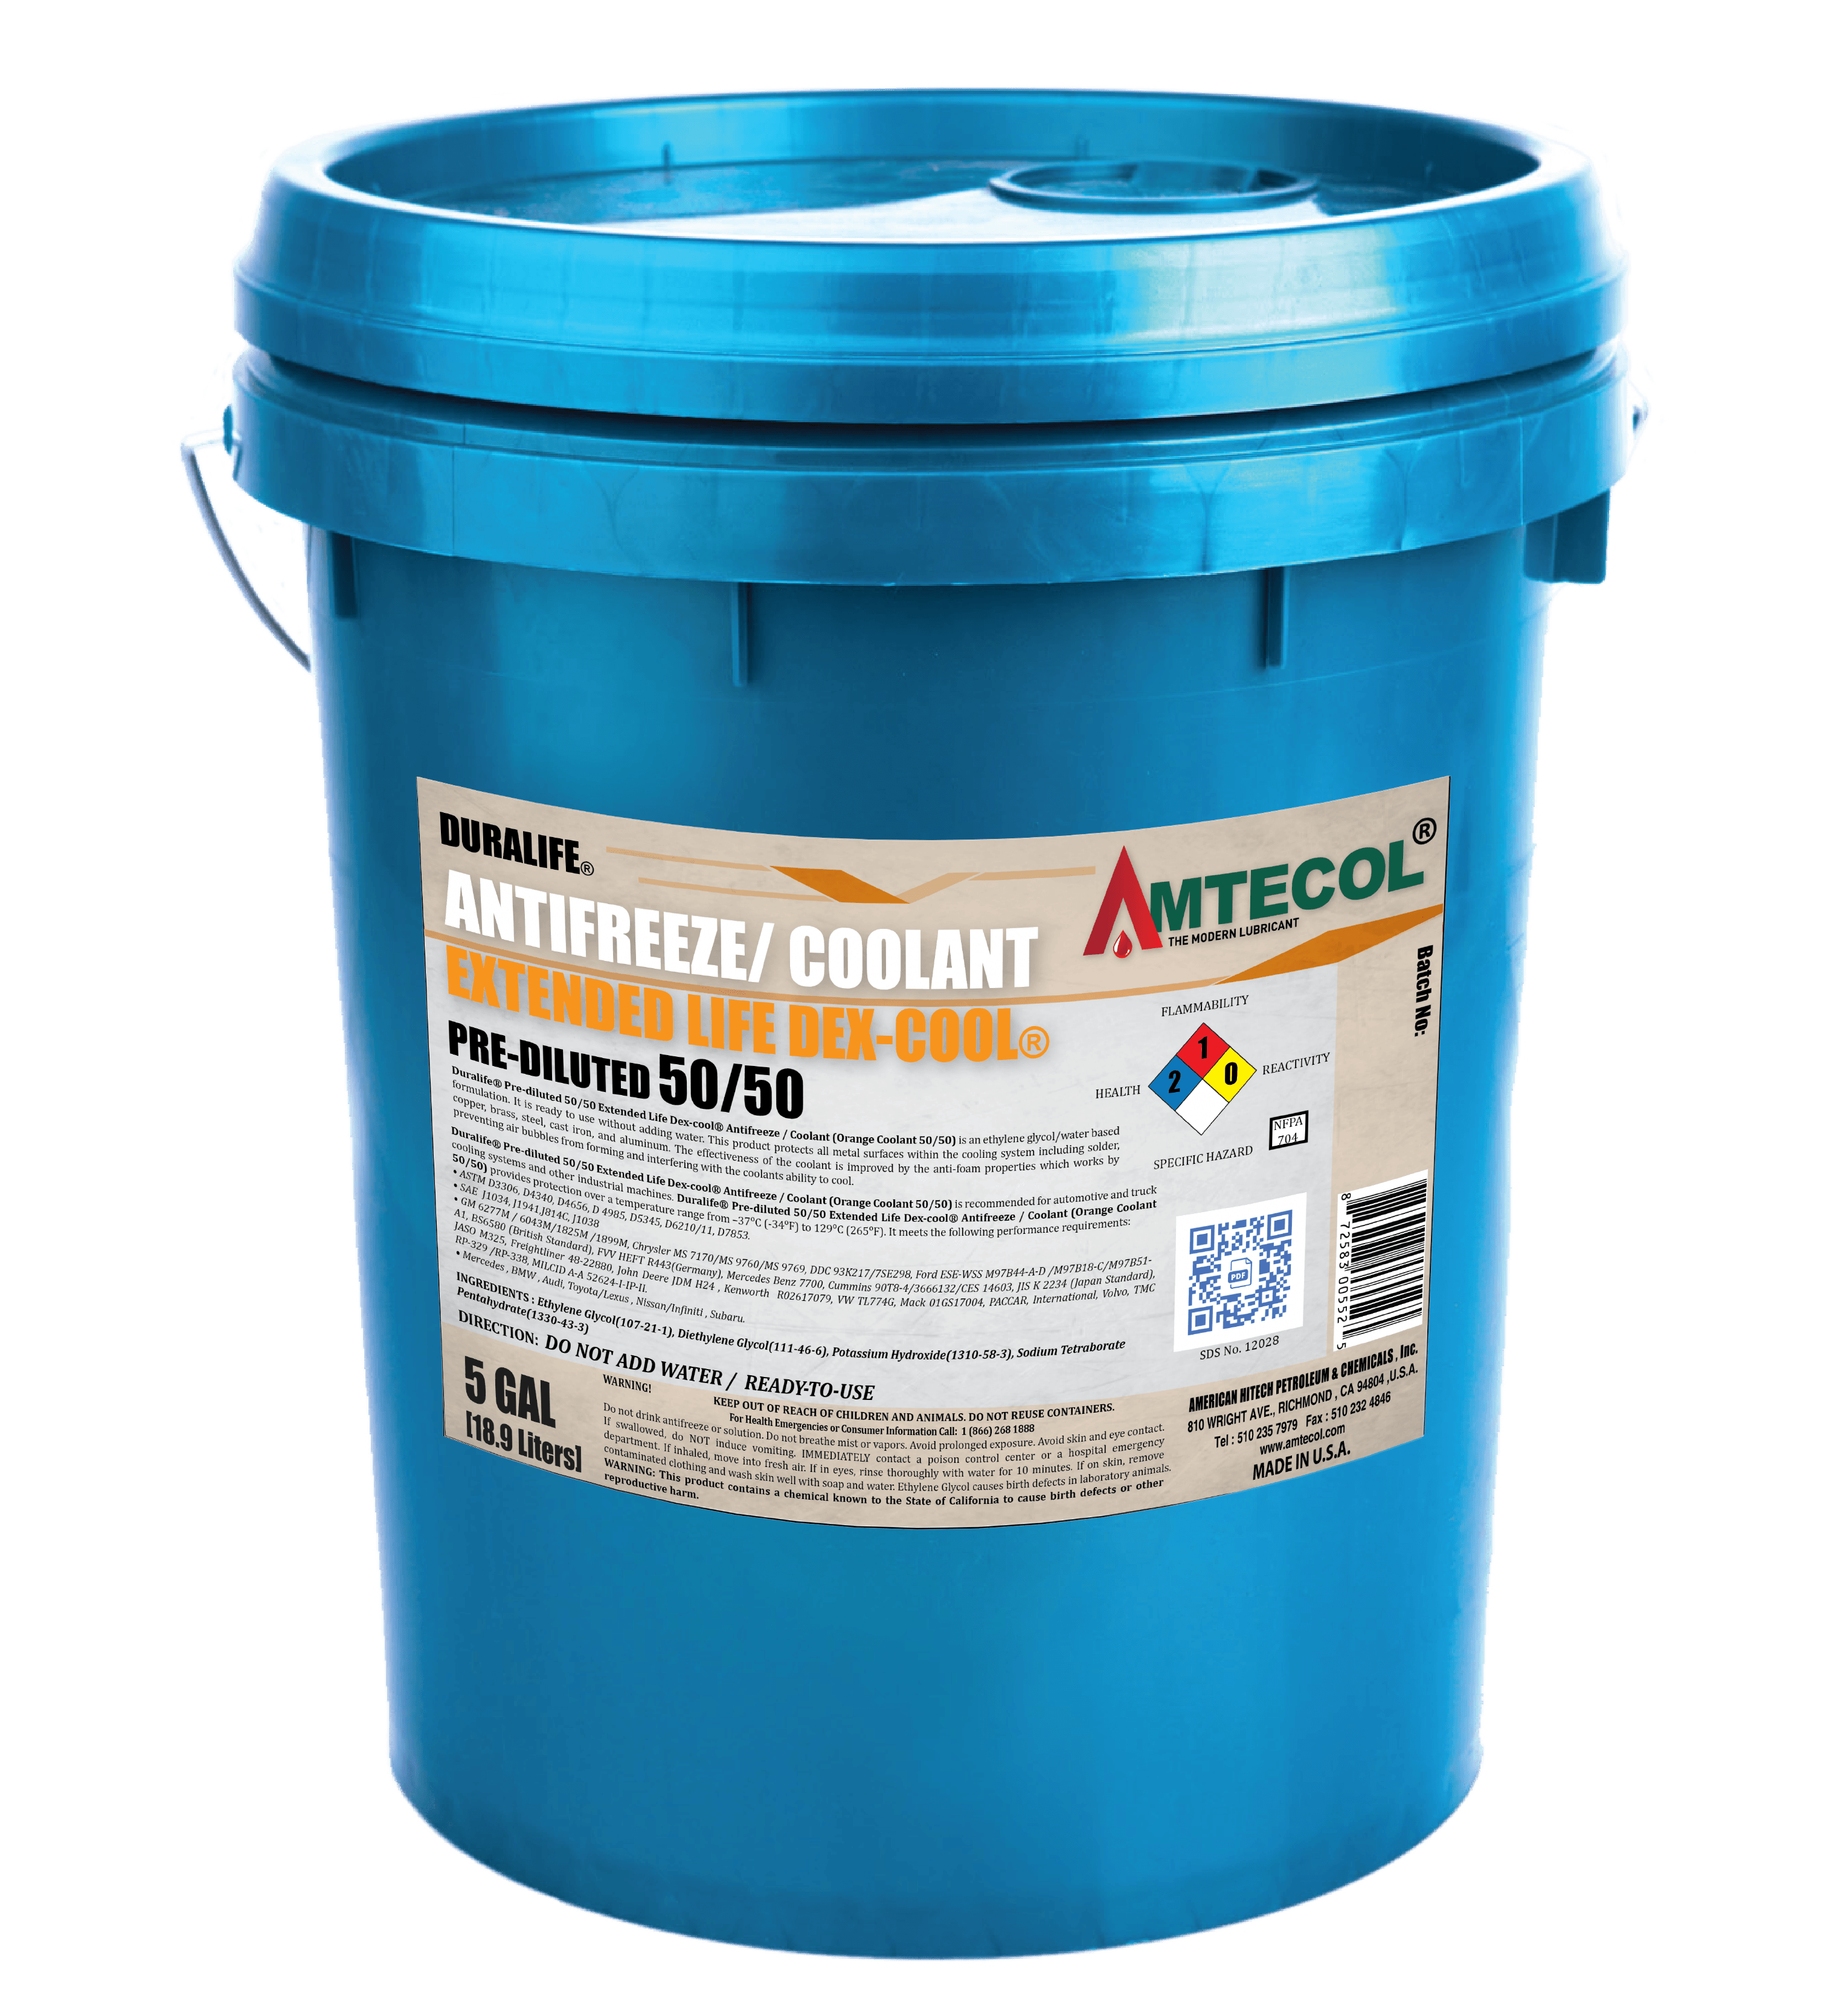 lubricants audi category antifreeze products automotive coolant amtecol